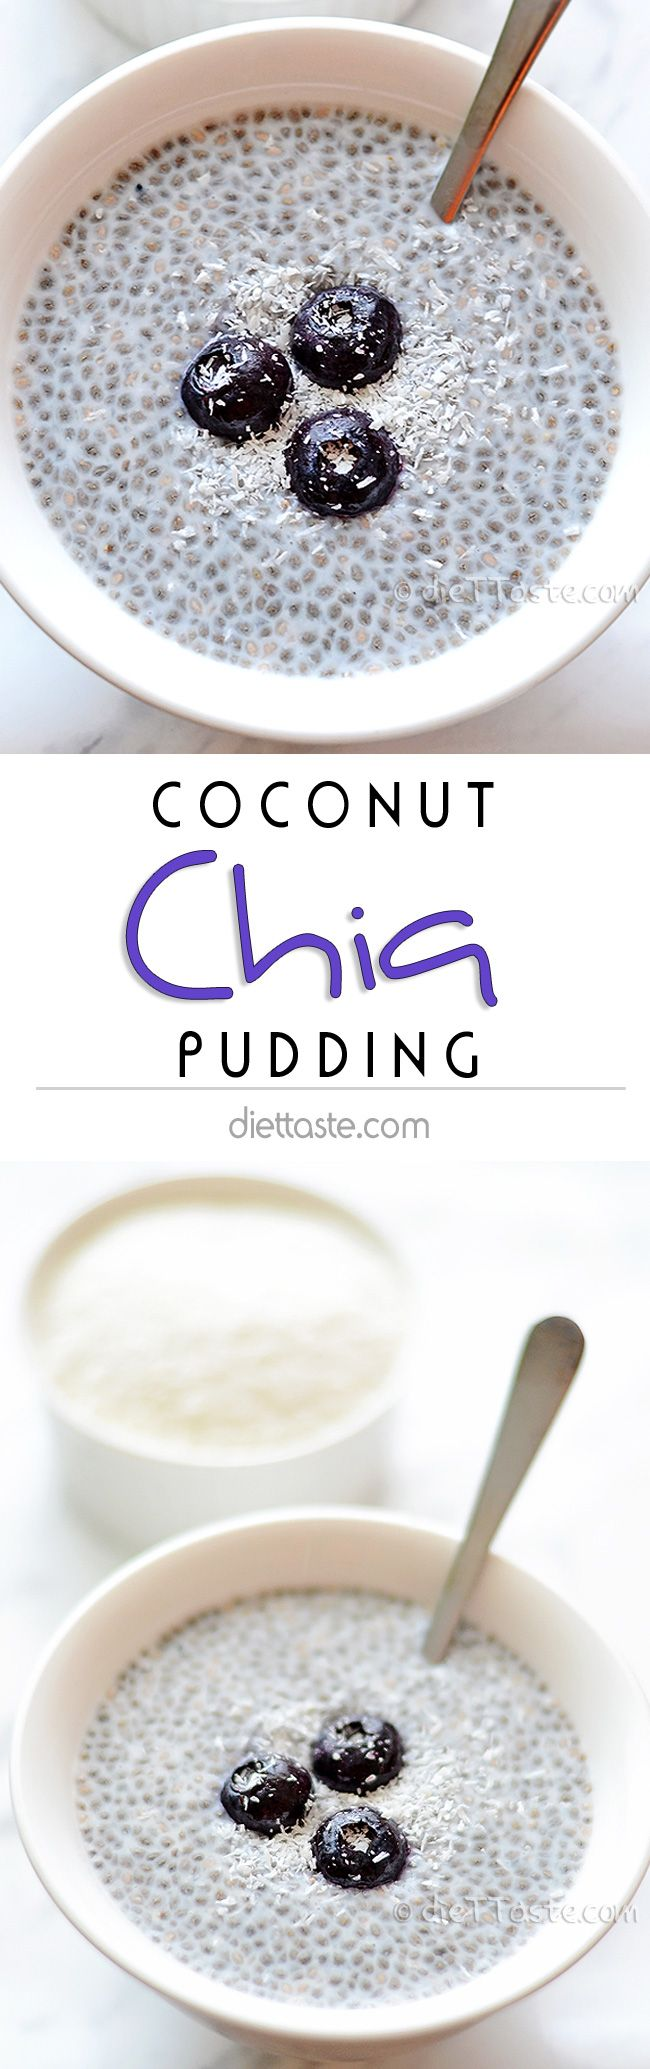 Coconut Chia Seed Pudding - creamy breakfast superfood that tastes like dessert; super easy to prepare - diettaste.com